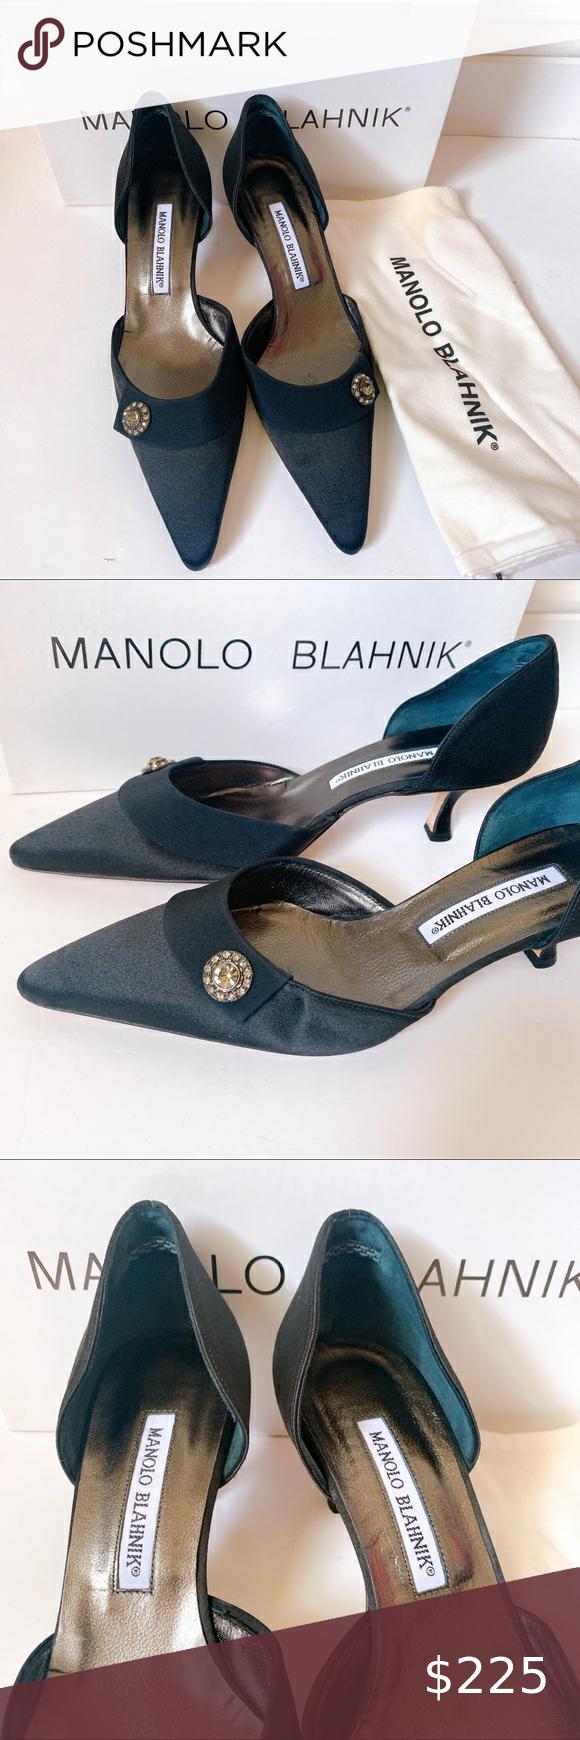 Manolo Blahnik Black Satin Crepe Kitten Heel Manolo Blahnik Black Satin Kitten Heel Never Been Worn Or Tried On In 2020 Manolo Blahnik Kitten Heels Shoes Women Heels